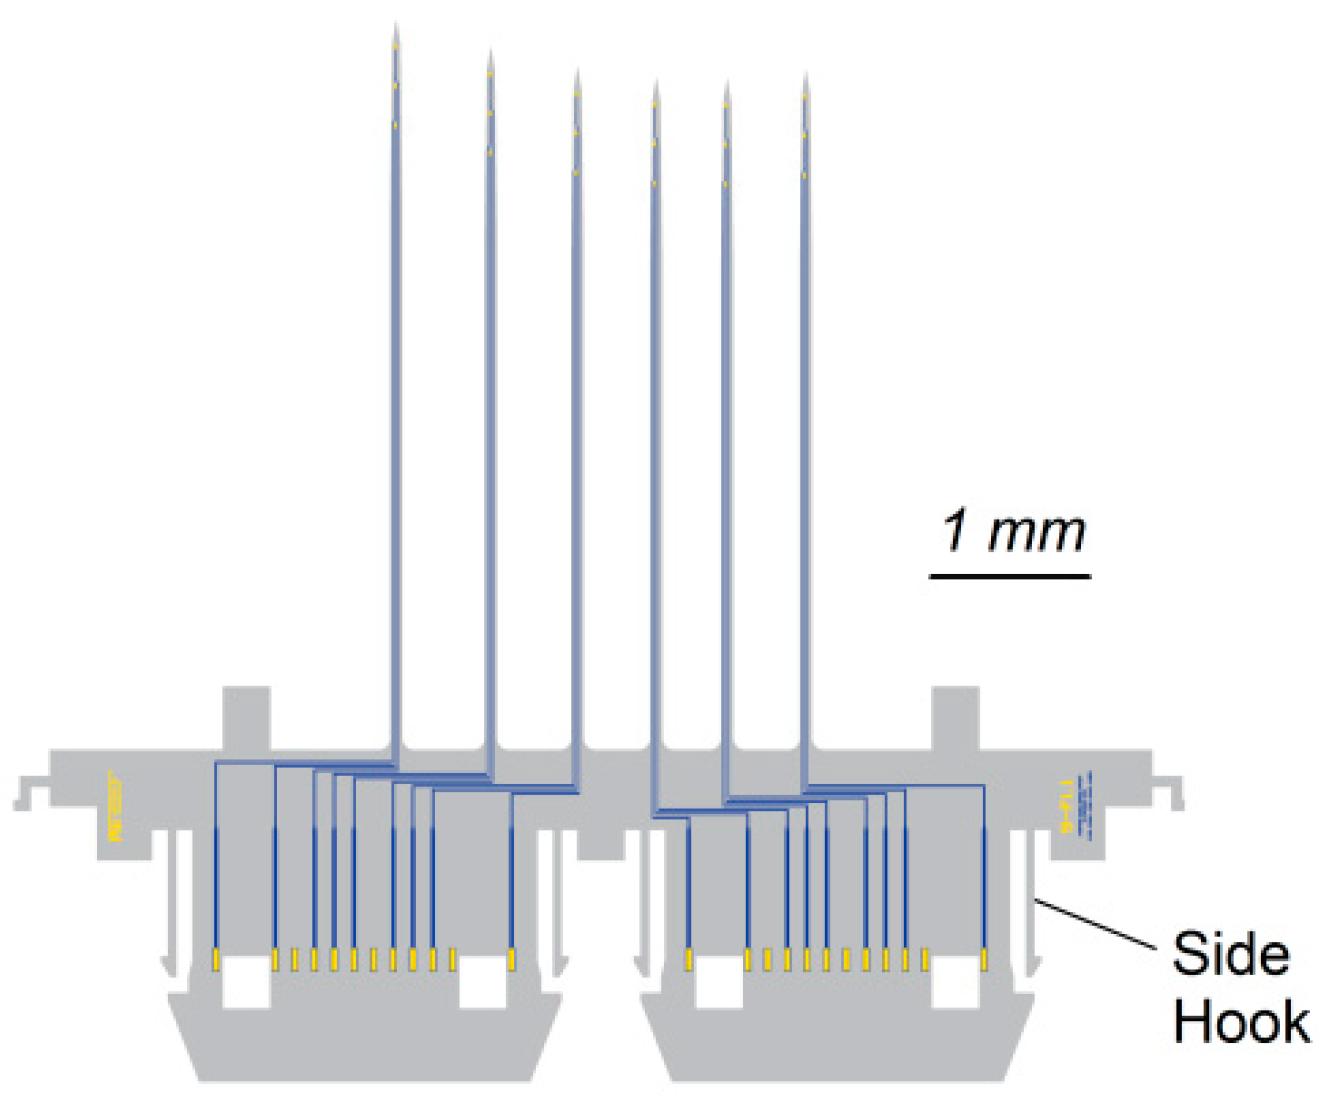 Ogm Nav Lights Wiring Diagram on